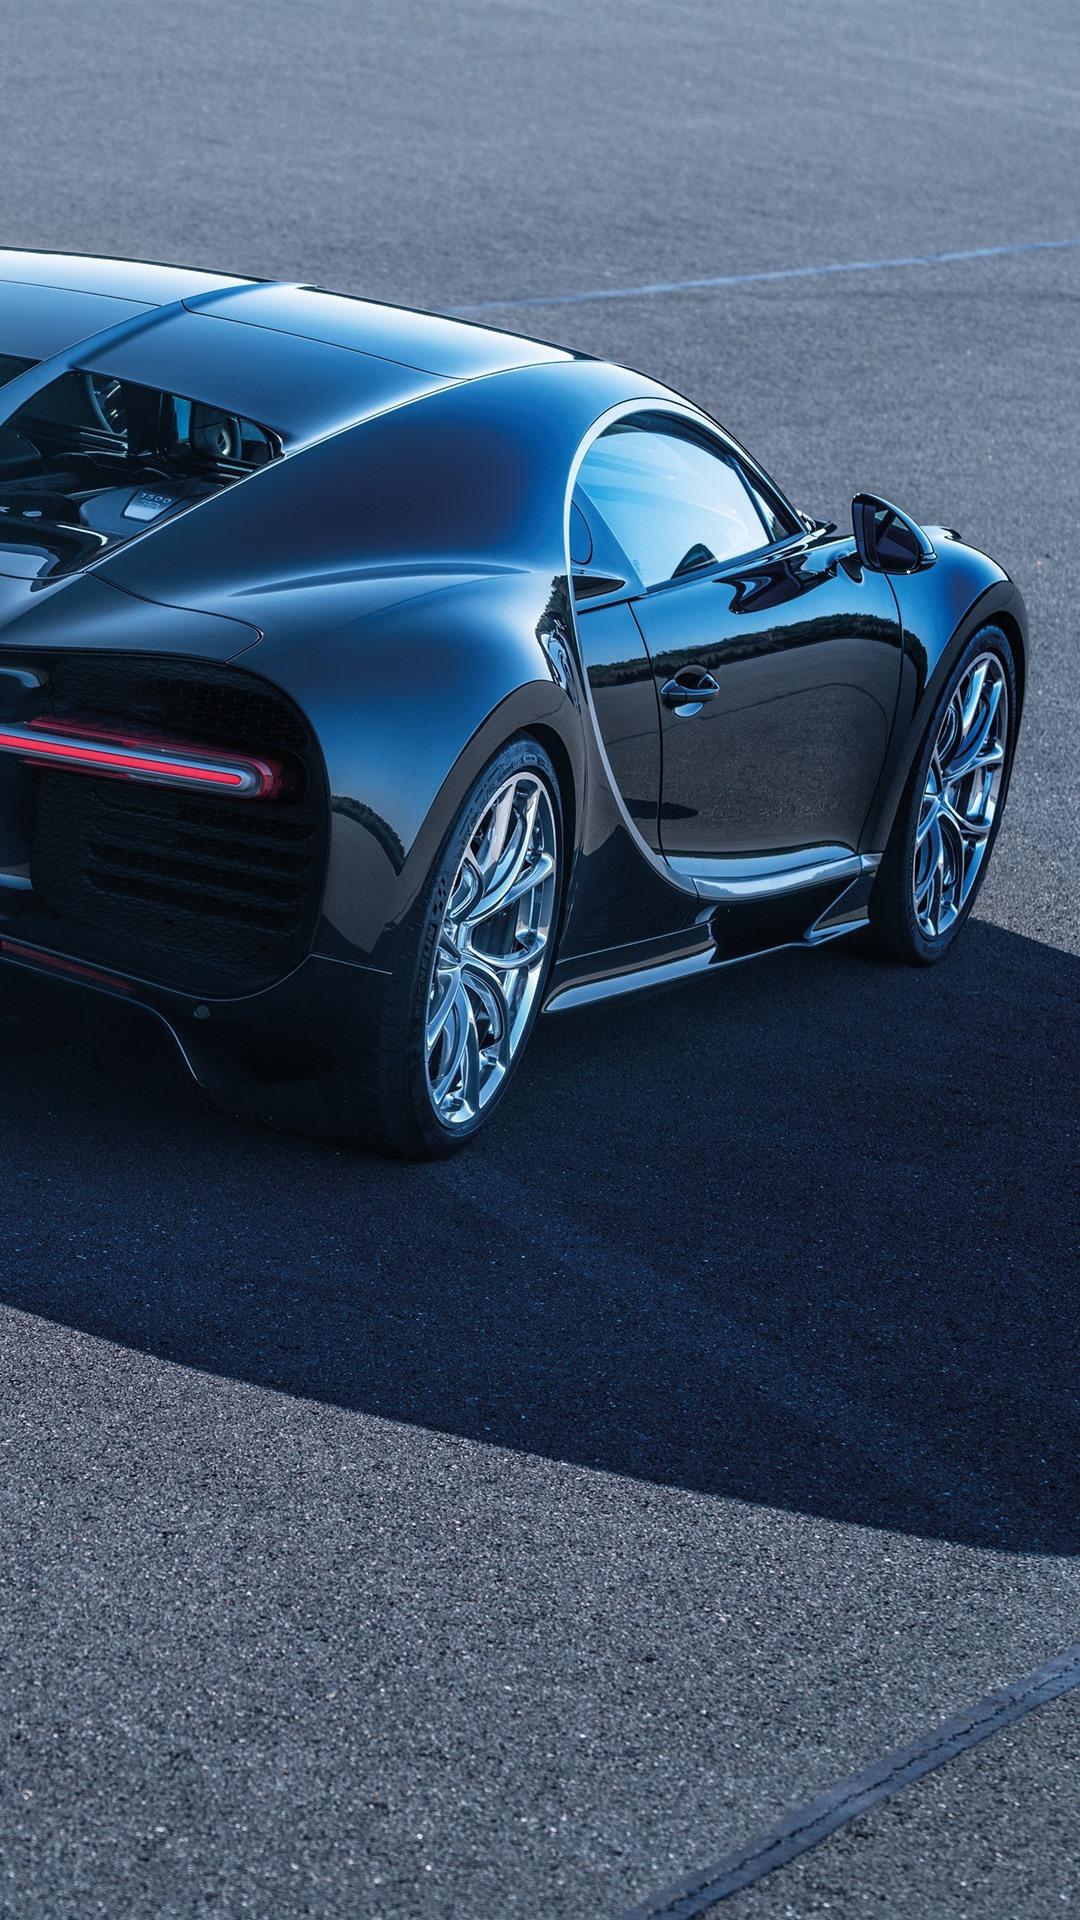 Wallpaper Bugatti Chiron Black Supercar Rear View